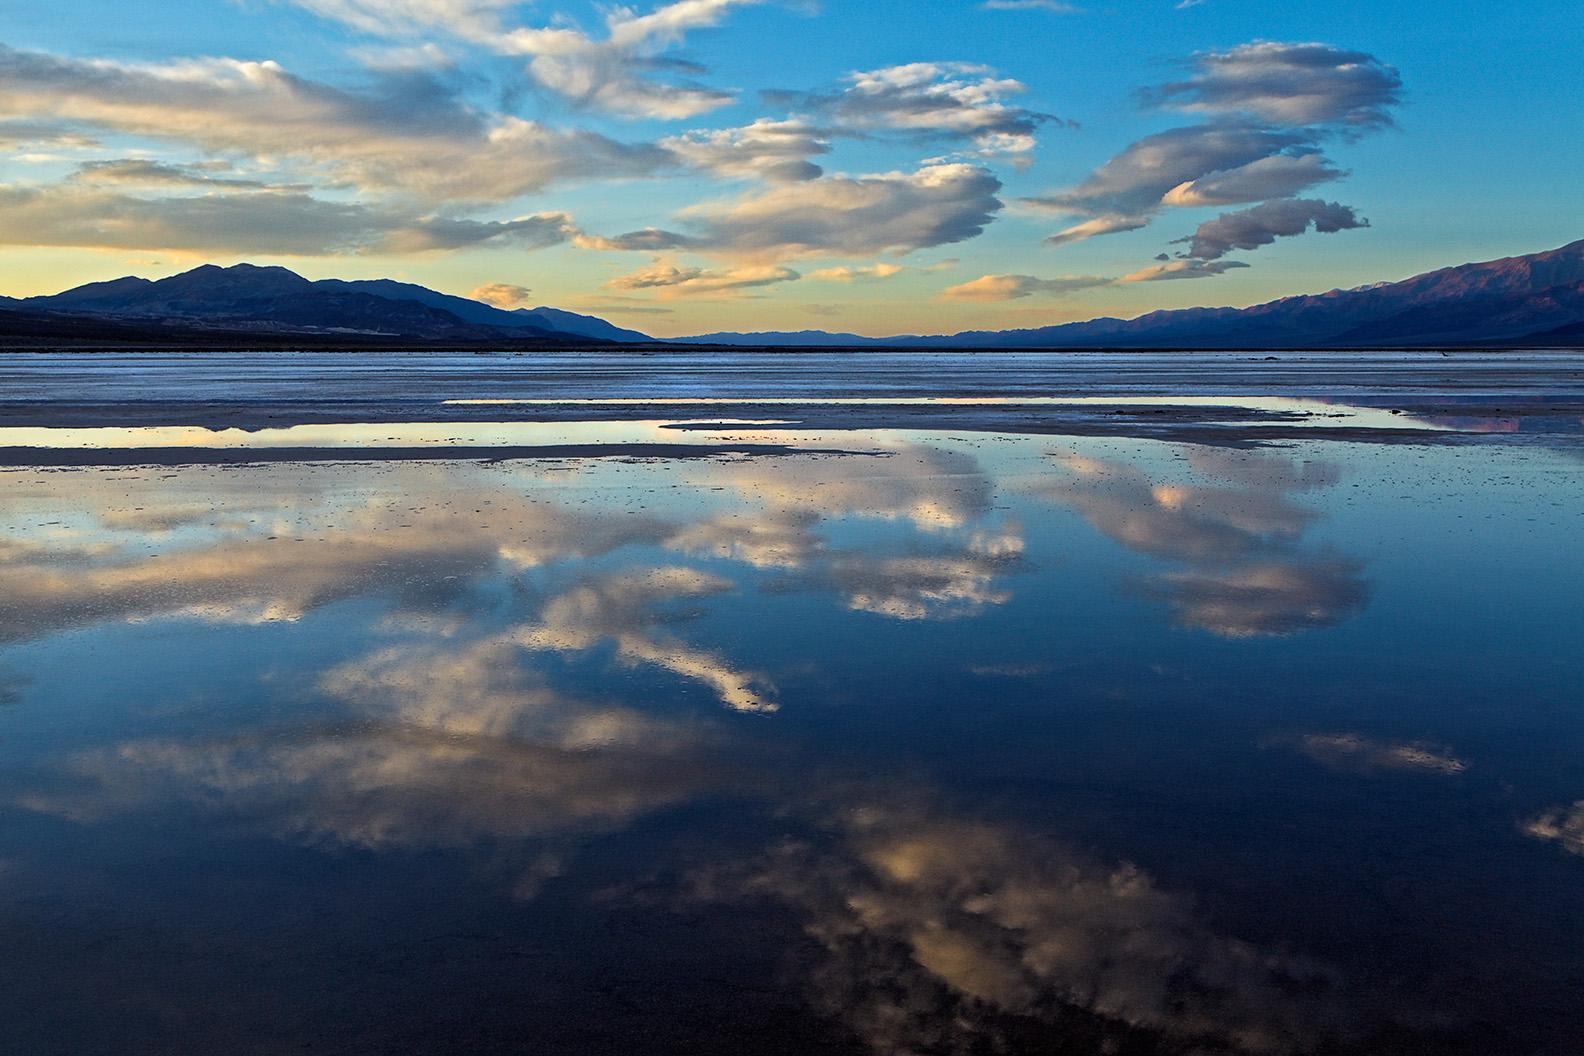 playa reflection.jpg